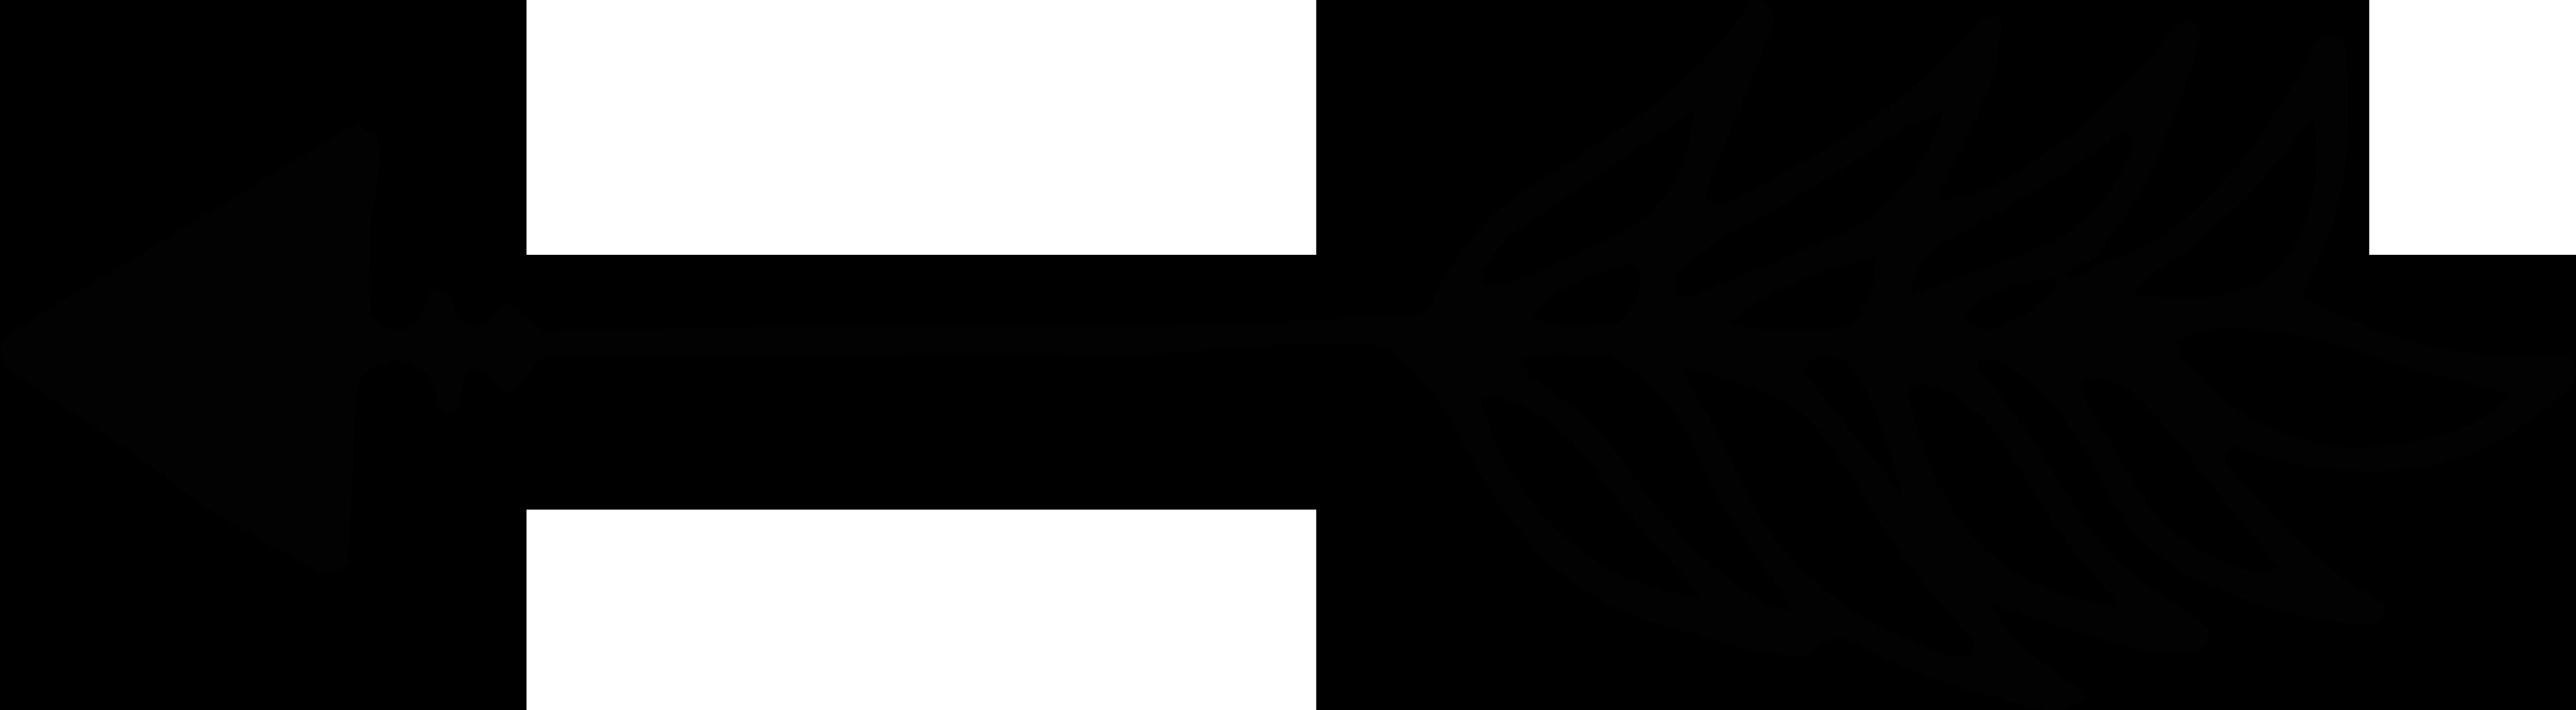 Clipart arrow filigree, Clipart arrow filigree Transparent.